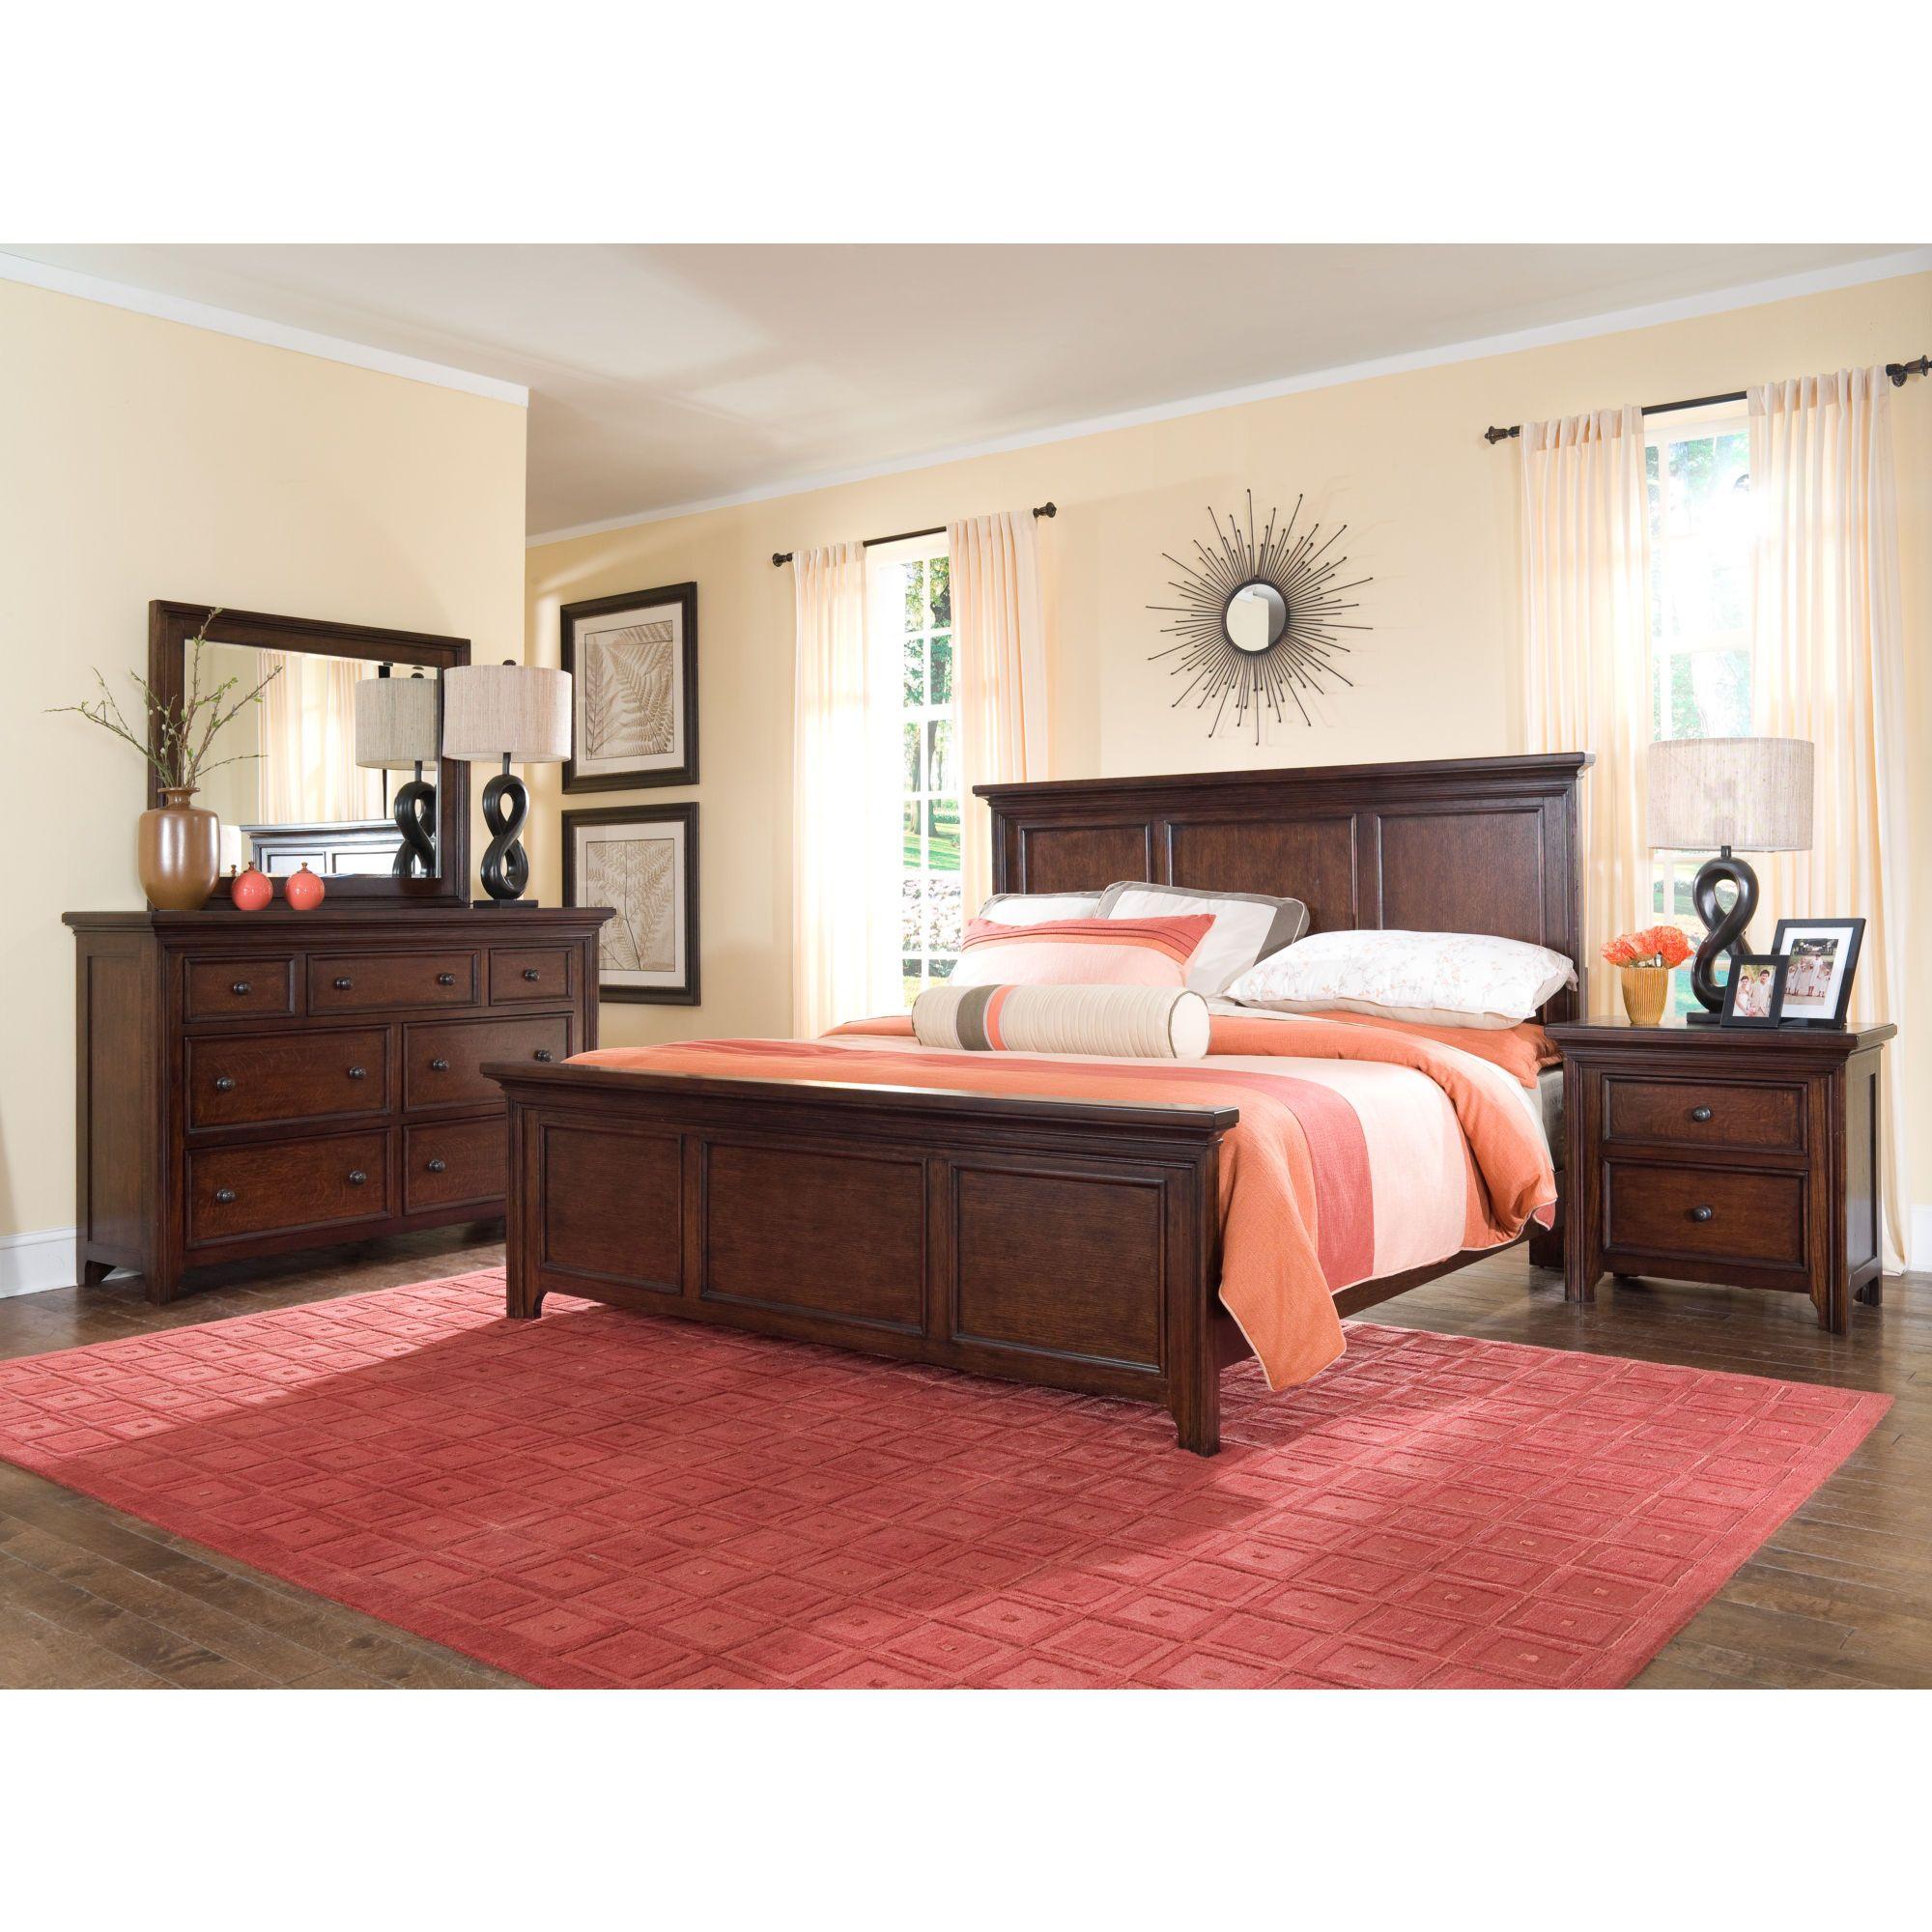 Best Broyhill Abbott Bay Panel Bedroom Set In Warm Brown 4880 400 x 300